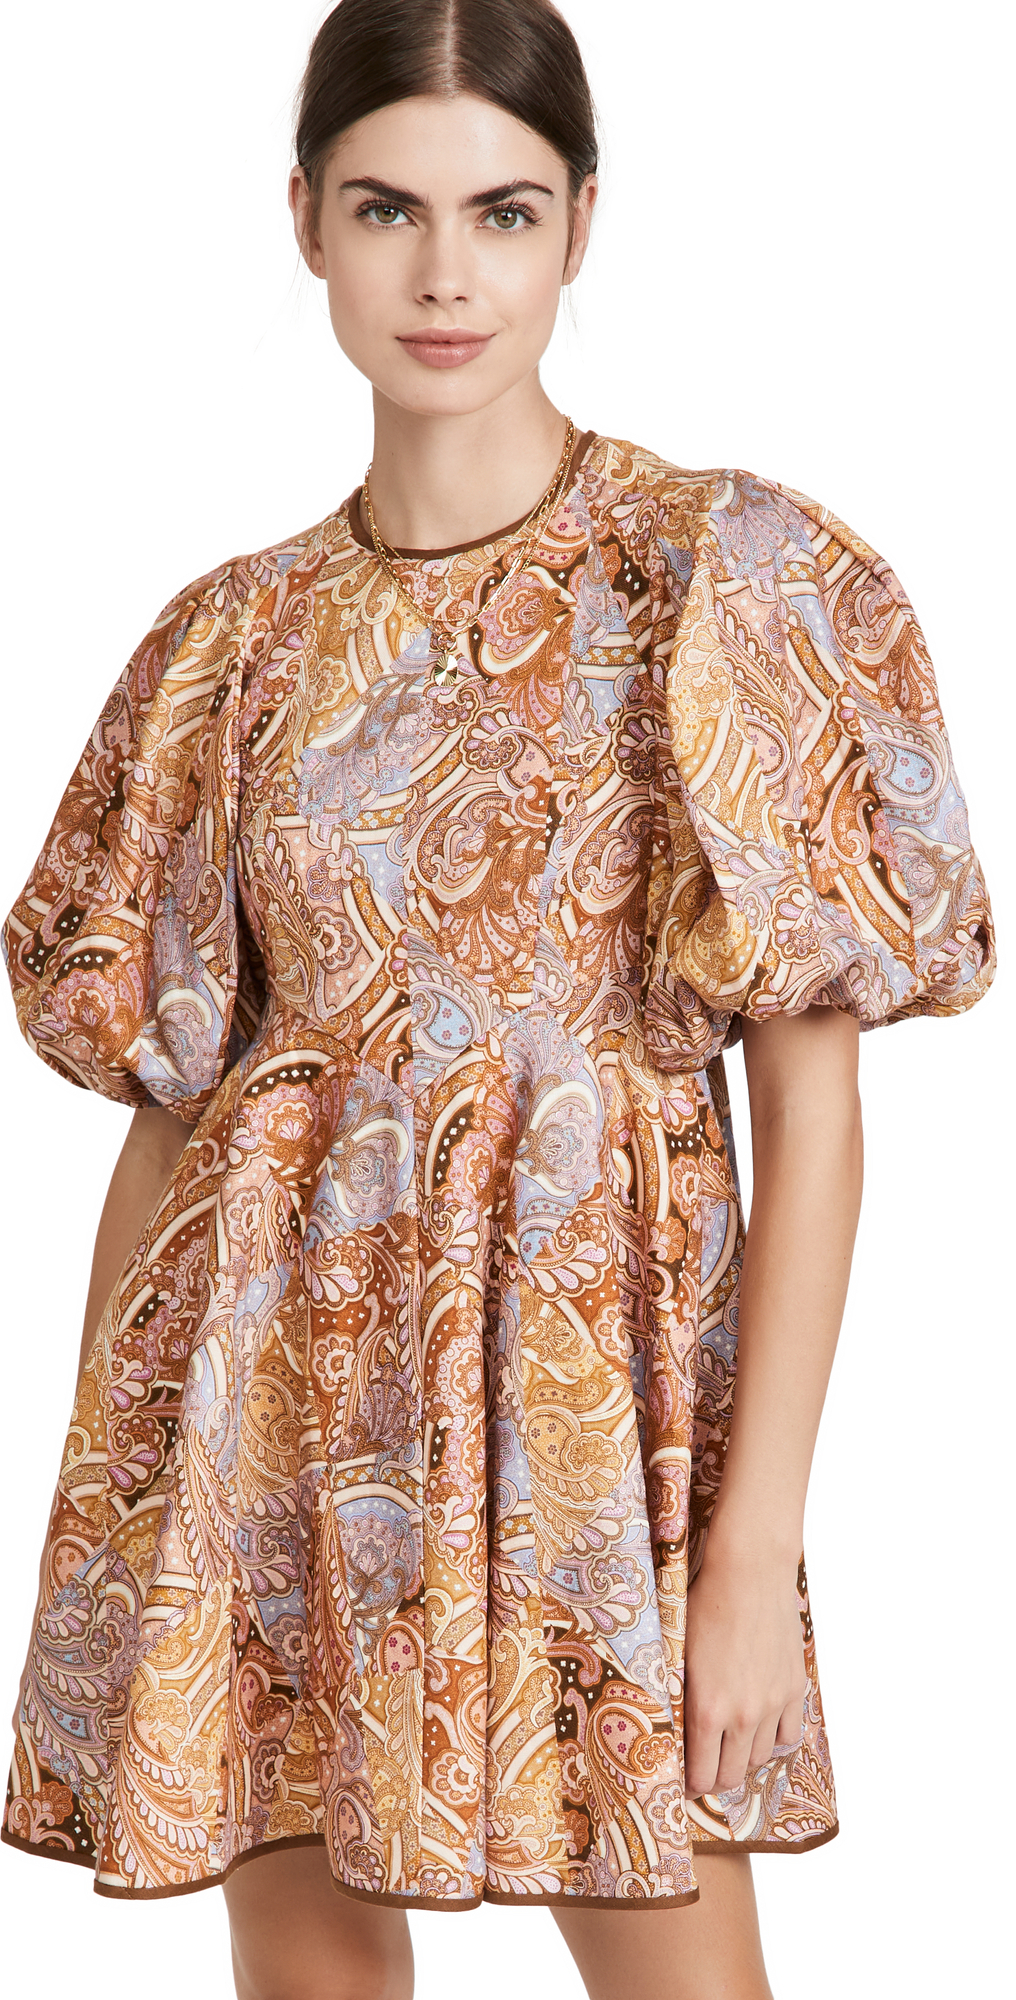 Zimmermann Concert Paisley Day Mini Dress